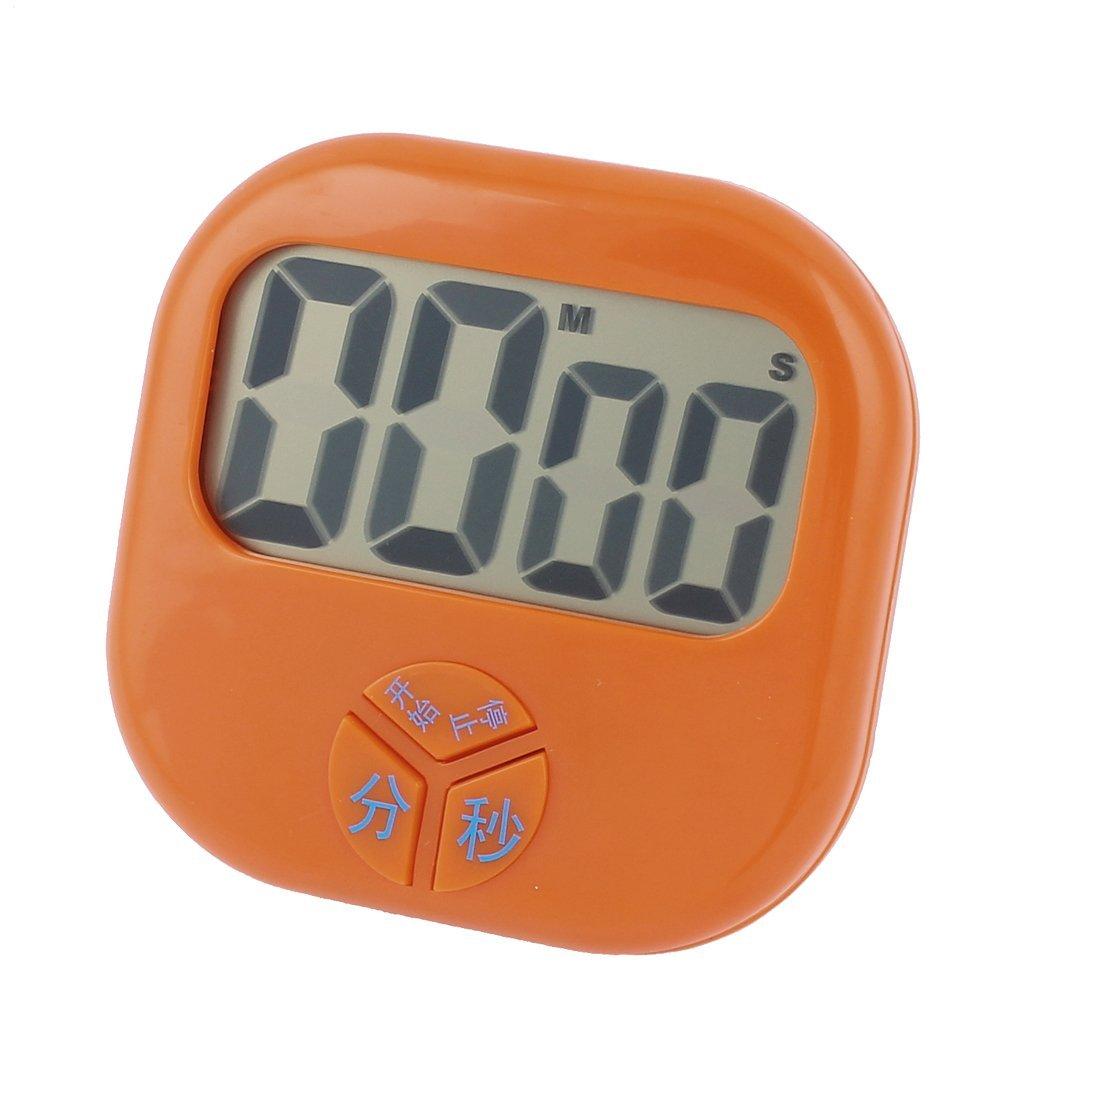 Compra Alarma portátil segundo minuto digital temporizador ...